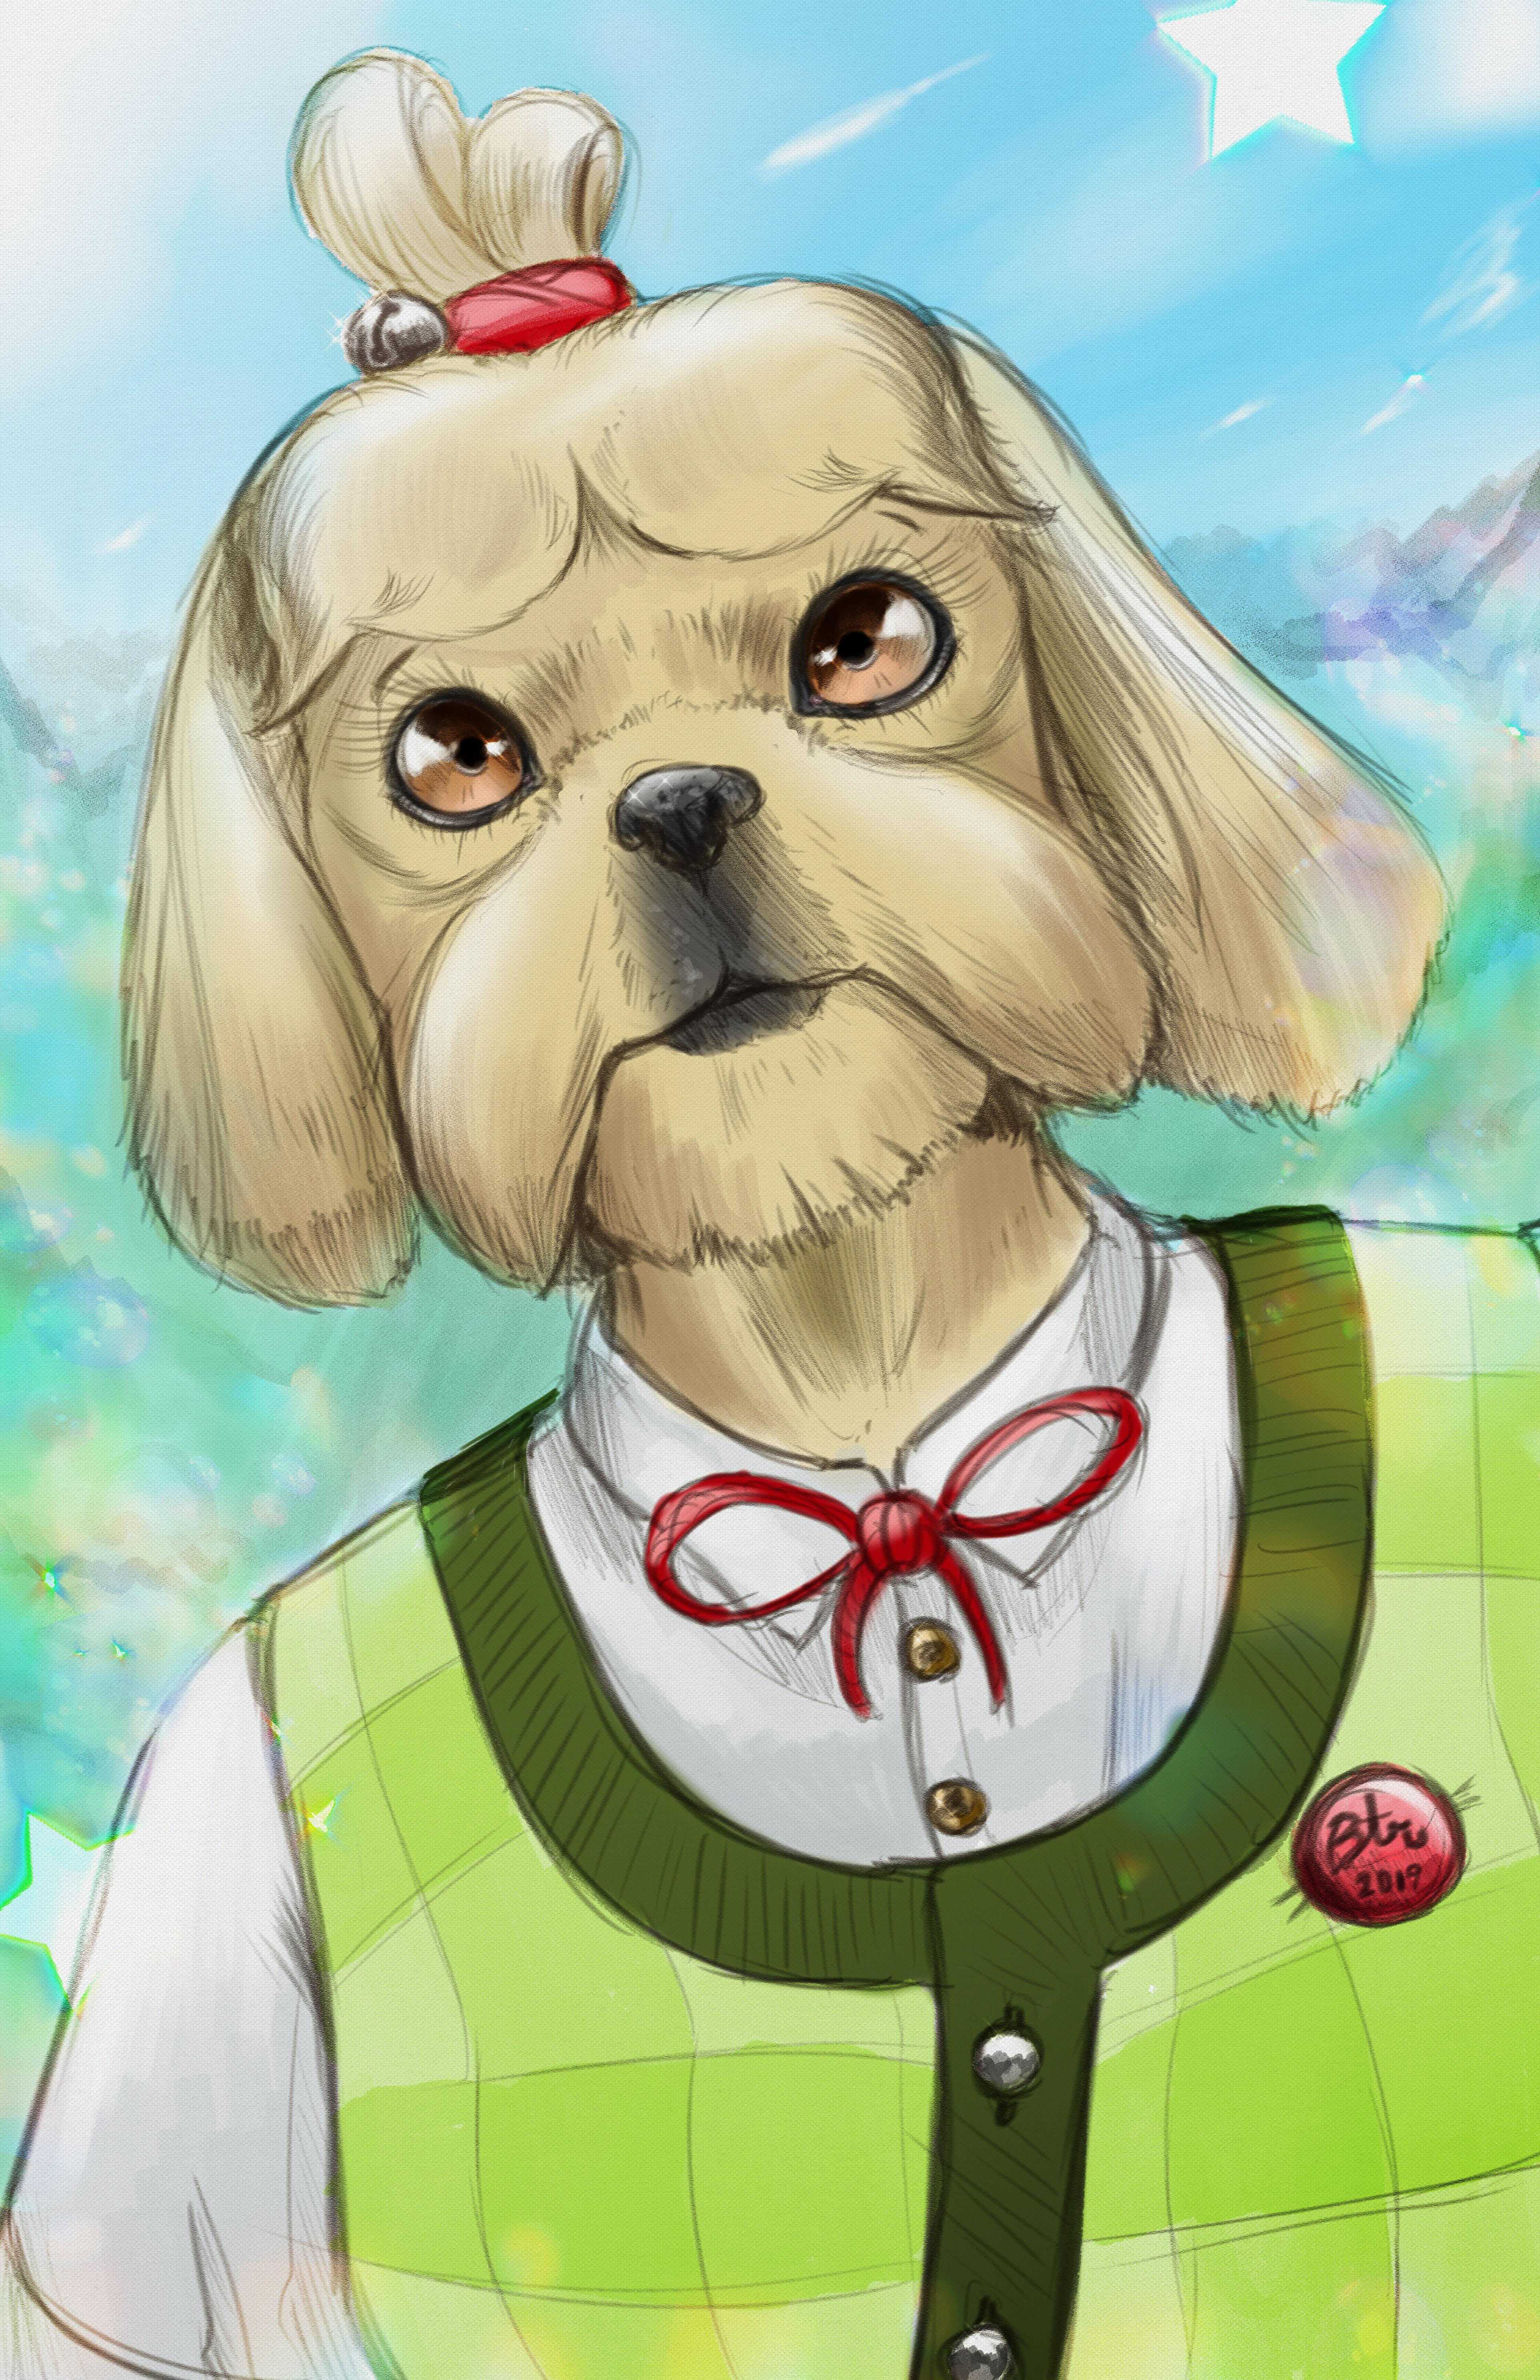 Isabelle 2019 Animal Crossing Fan Art By Benjaminratterman